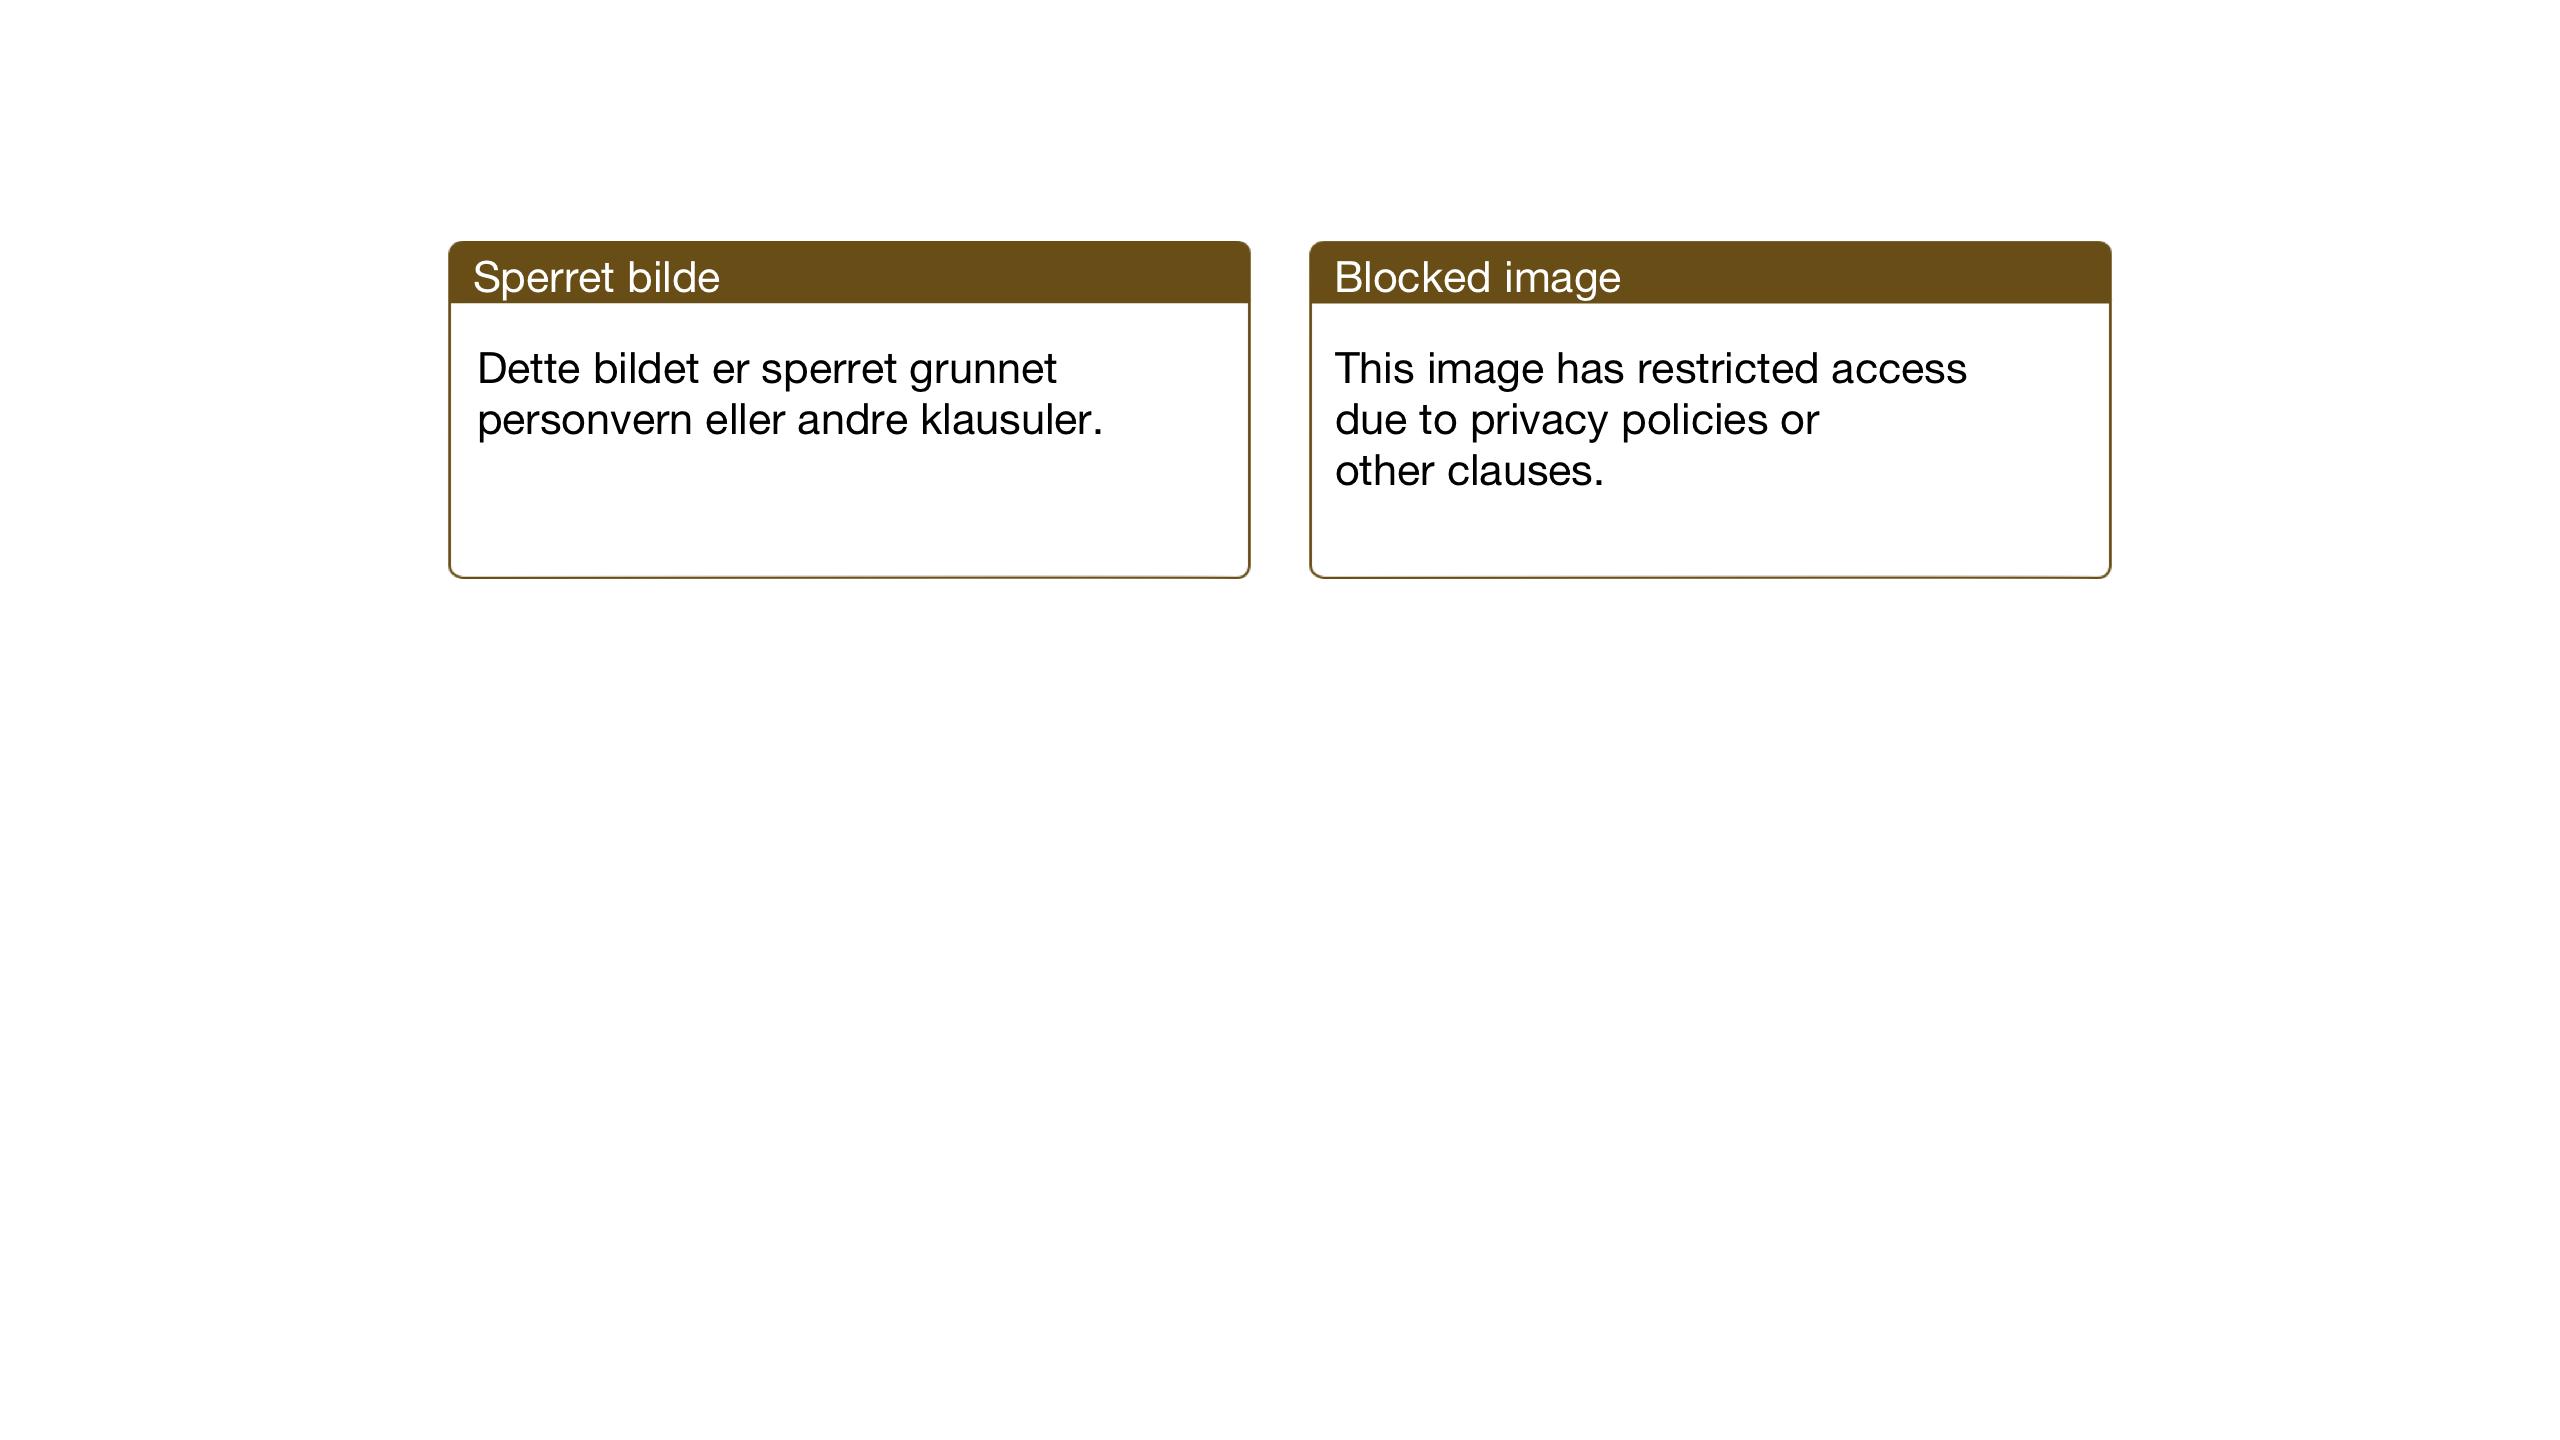 SAT, Ministerialprotokoller, klokkerbøker og fødselsregistre - Nordland, 827/L0425: Klokkerbok nr. 827C14, 1931-1946, s. 4